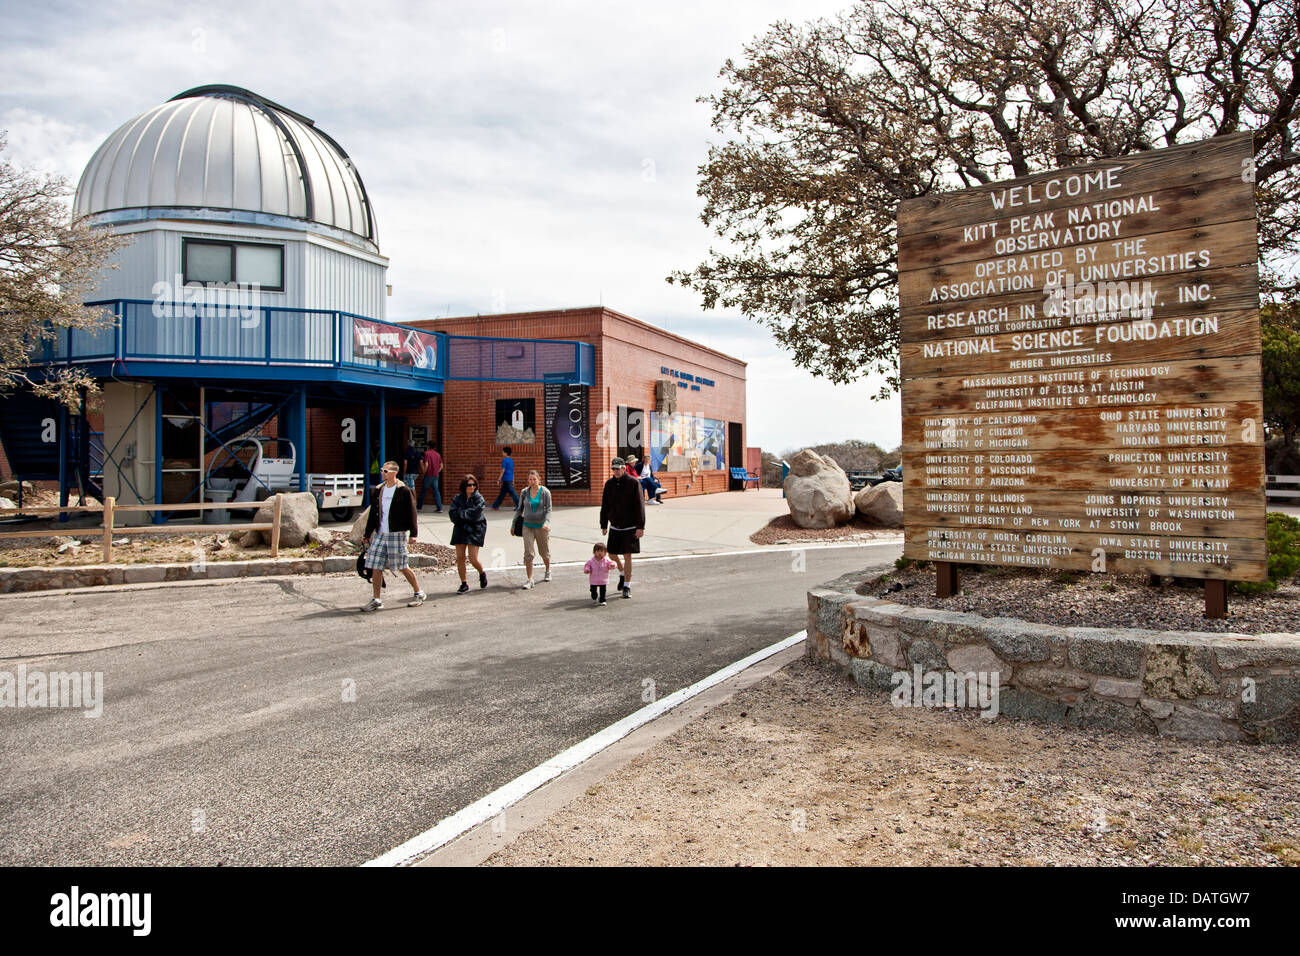 Kitt Peak National Observatory 'KPNO' . Immagini Stock